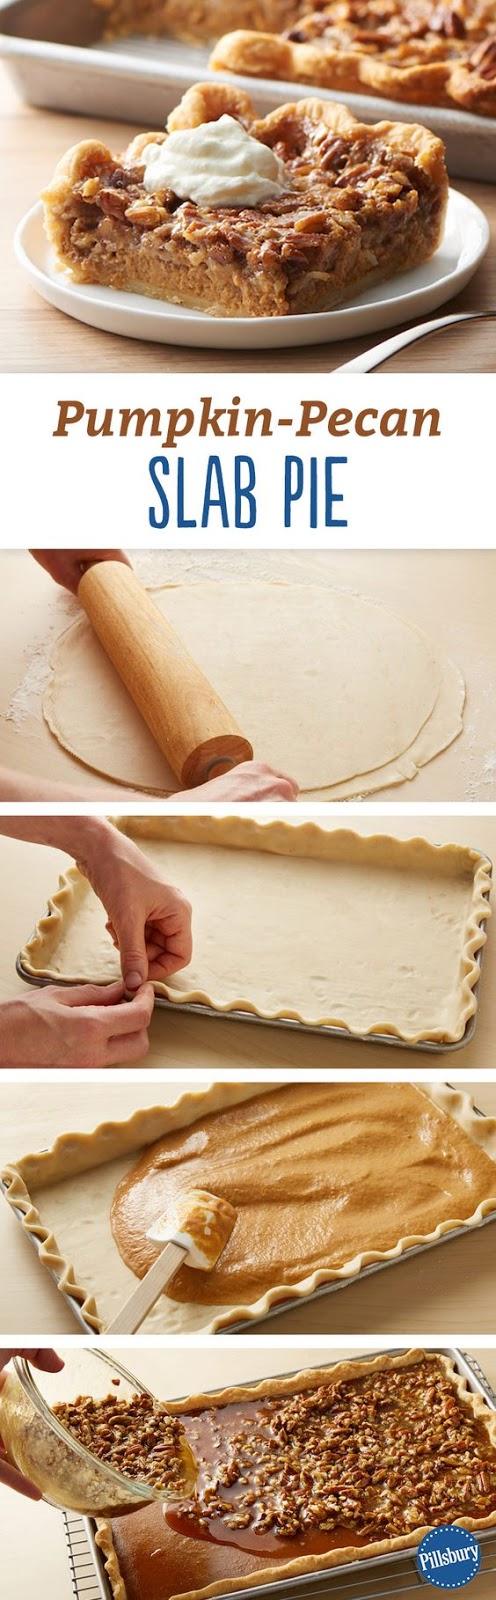 Pumpkin-Pecan Slab Pie